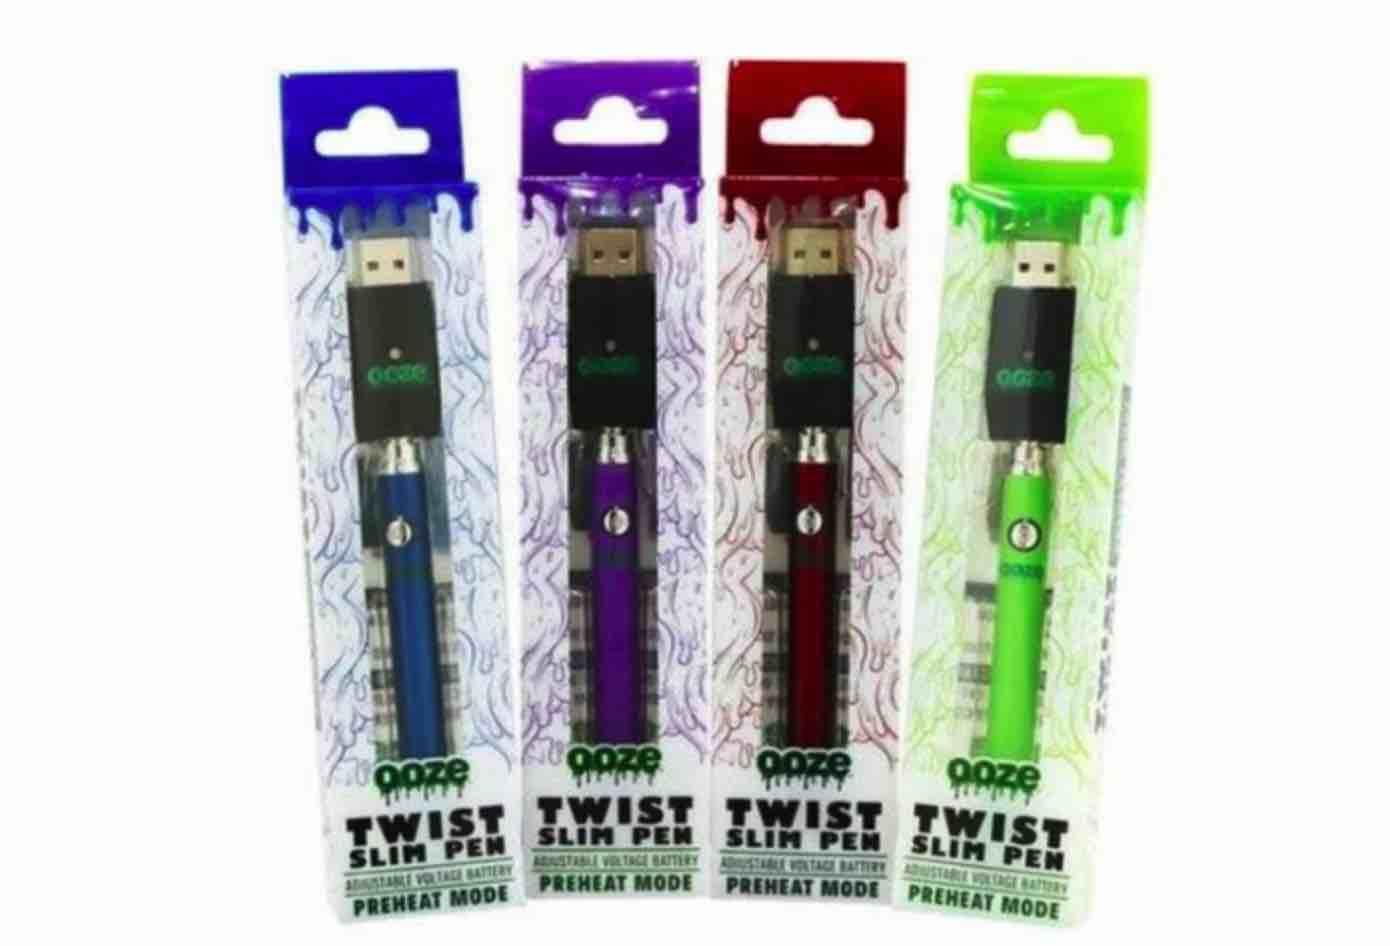 The Ooze Twist Slim Pen Review